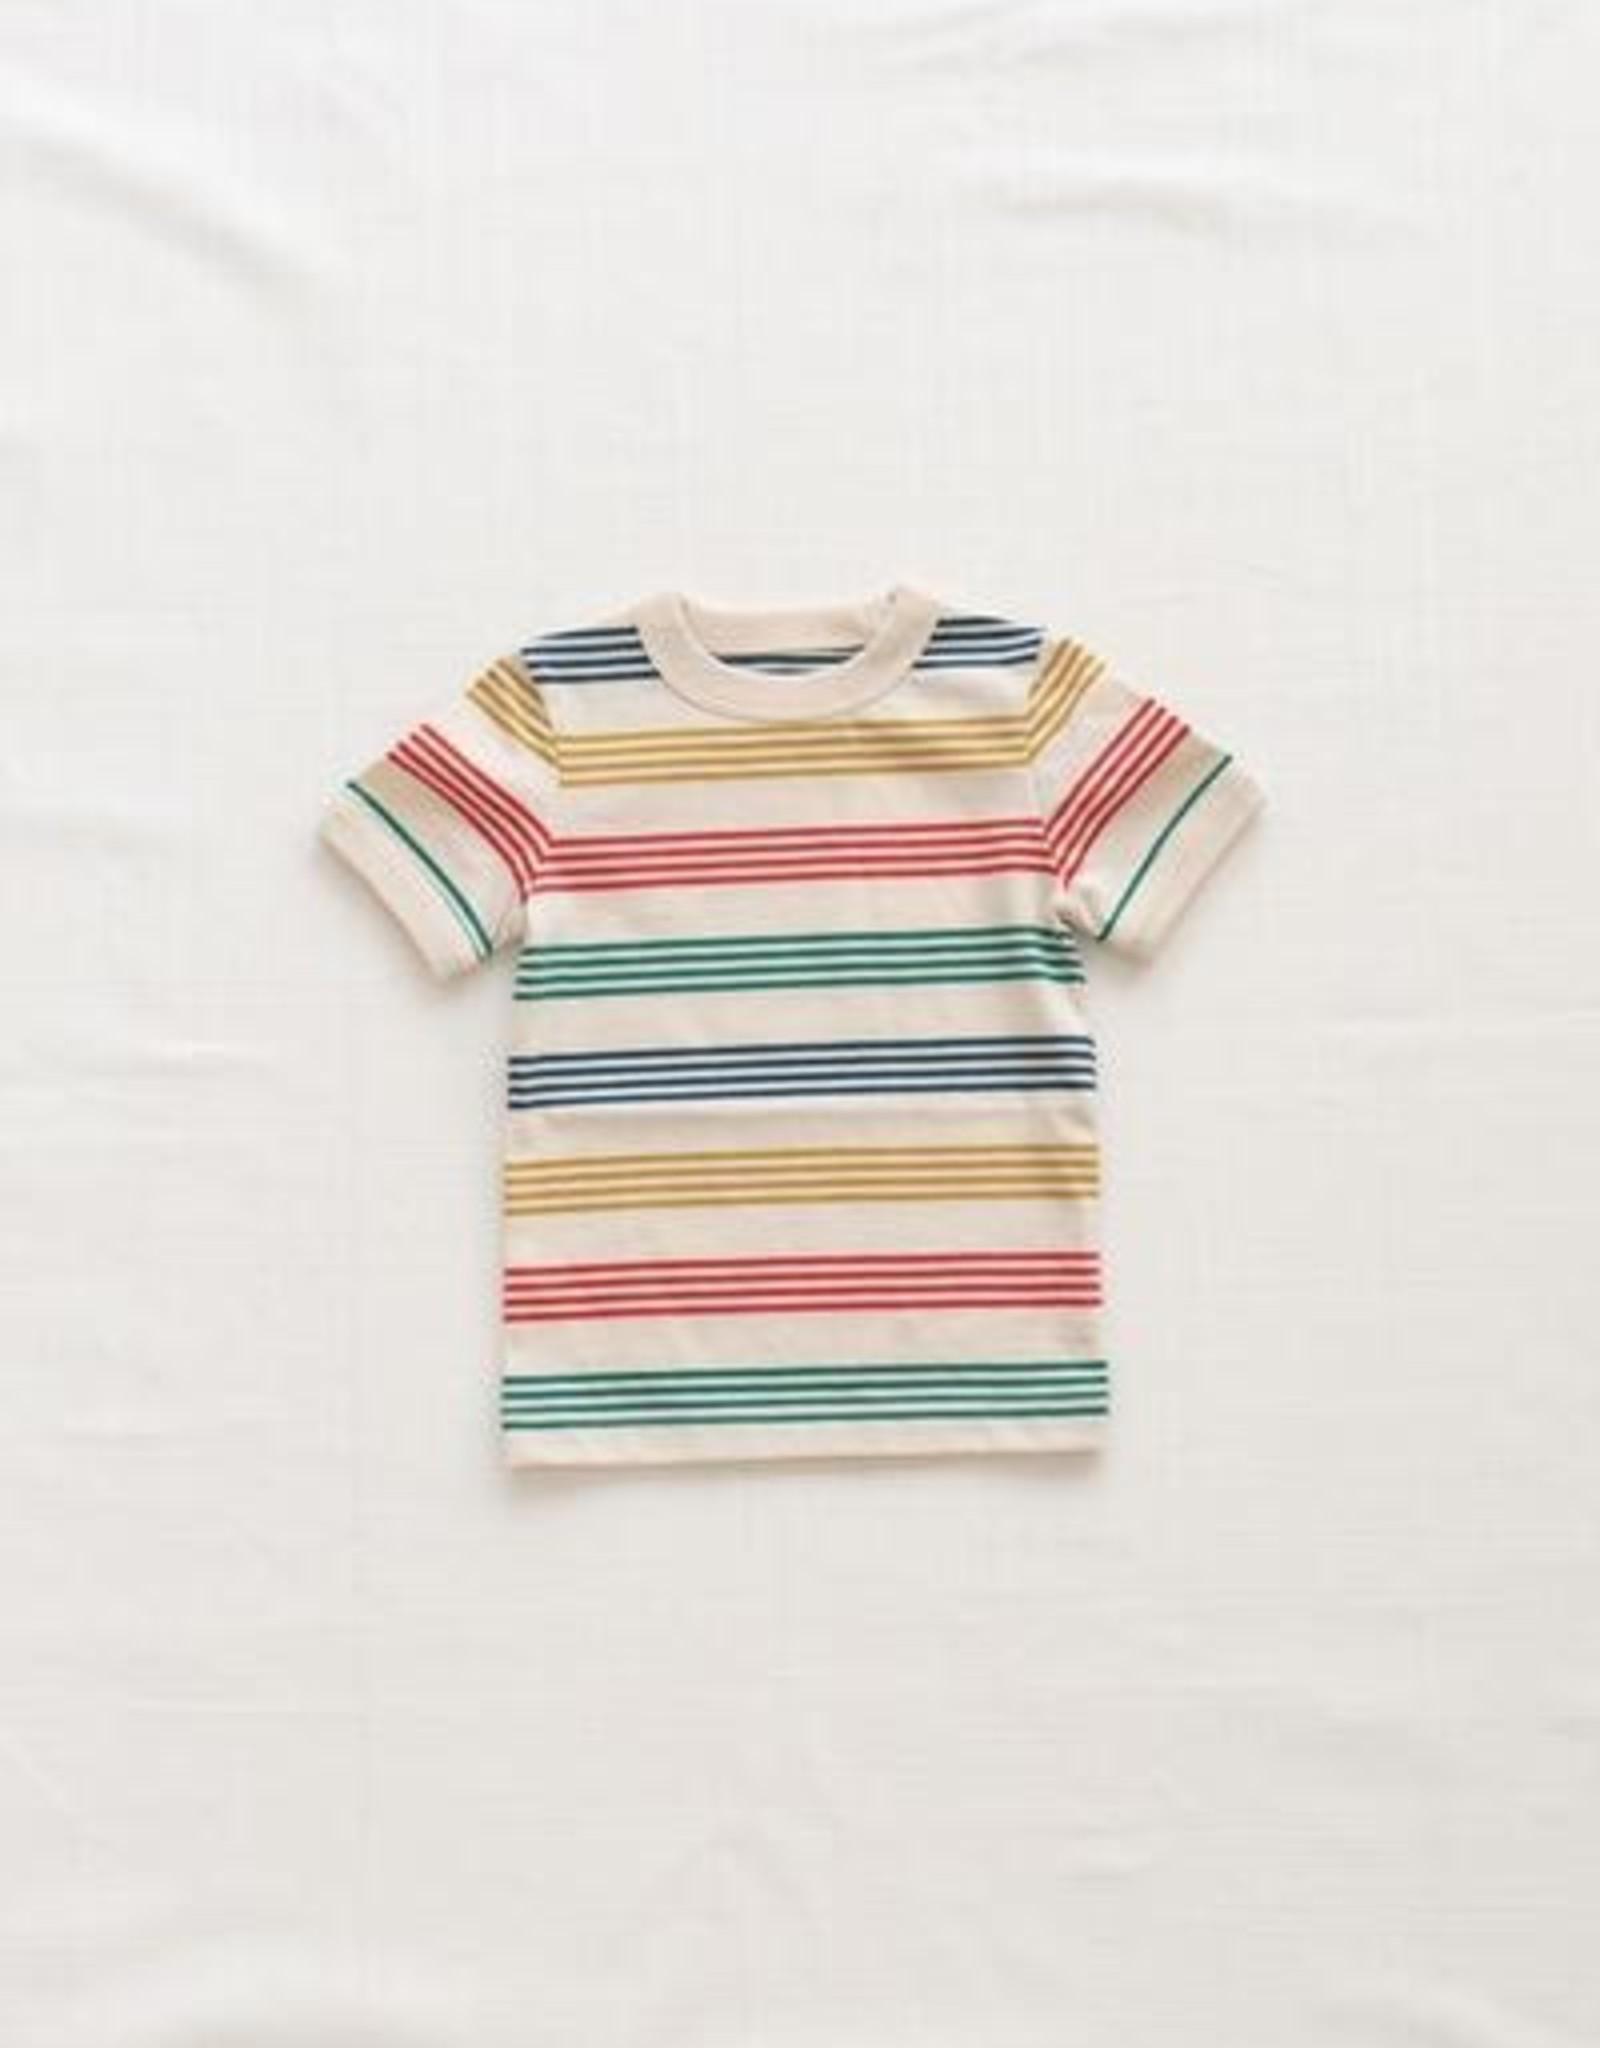 Fin & Vince T-shirt Vintage - Rayures Arc-en-ciel